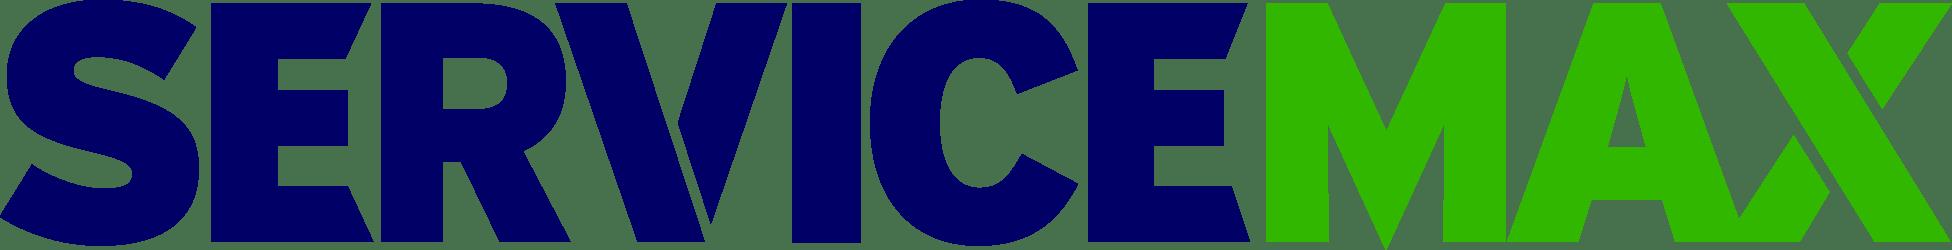 servicemax-2019-logo-01